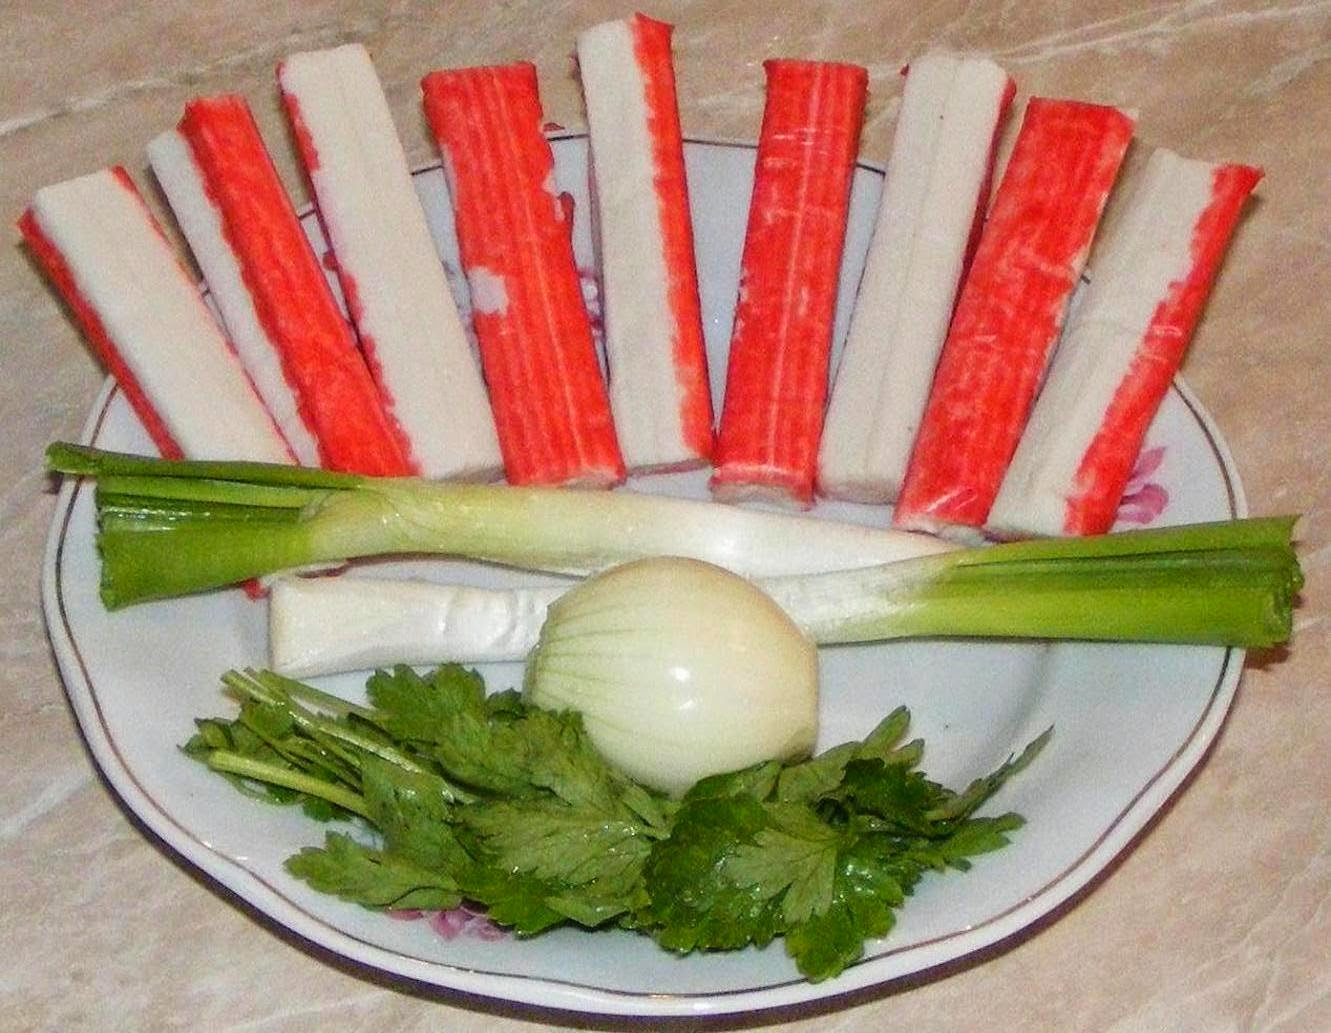 ingrediente salata de surimi, cum se prepara salata de surimi, cum facem salata de surimi, retete si preparate culinare straine, reteta salata de surimi cu maioneza, retete salata de surimi cu maioneza,